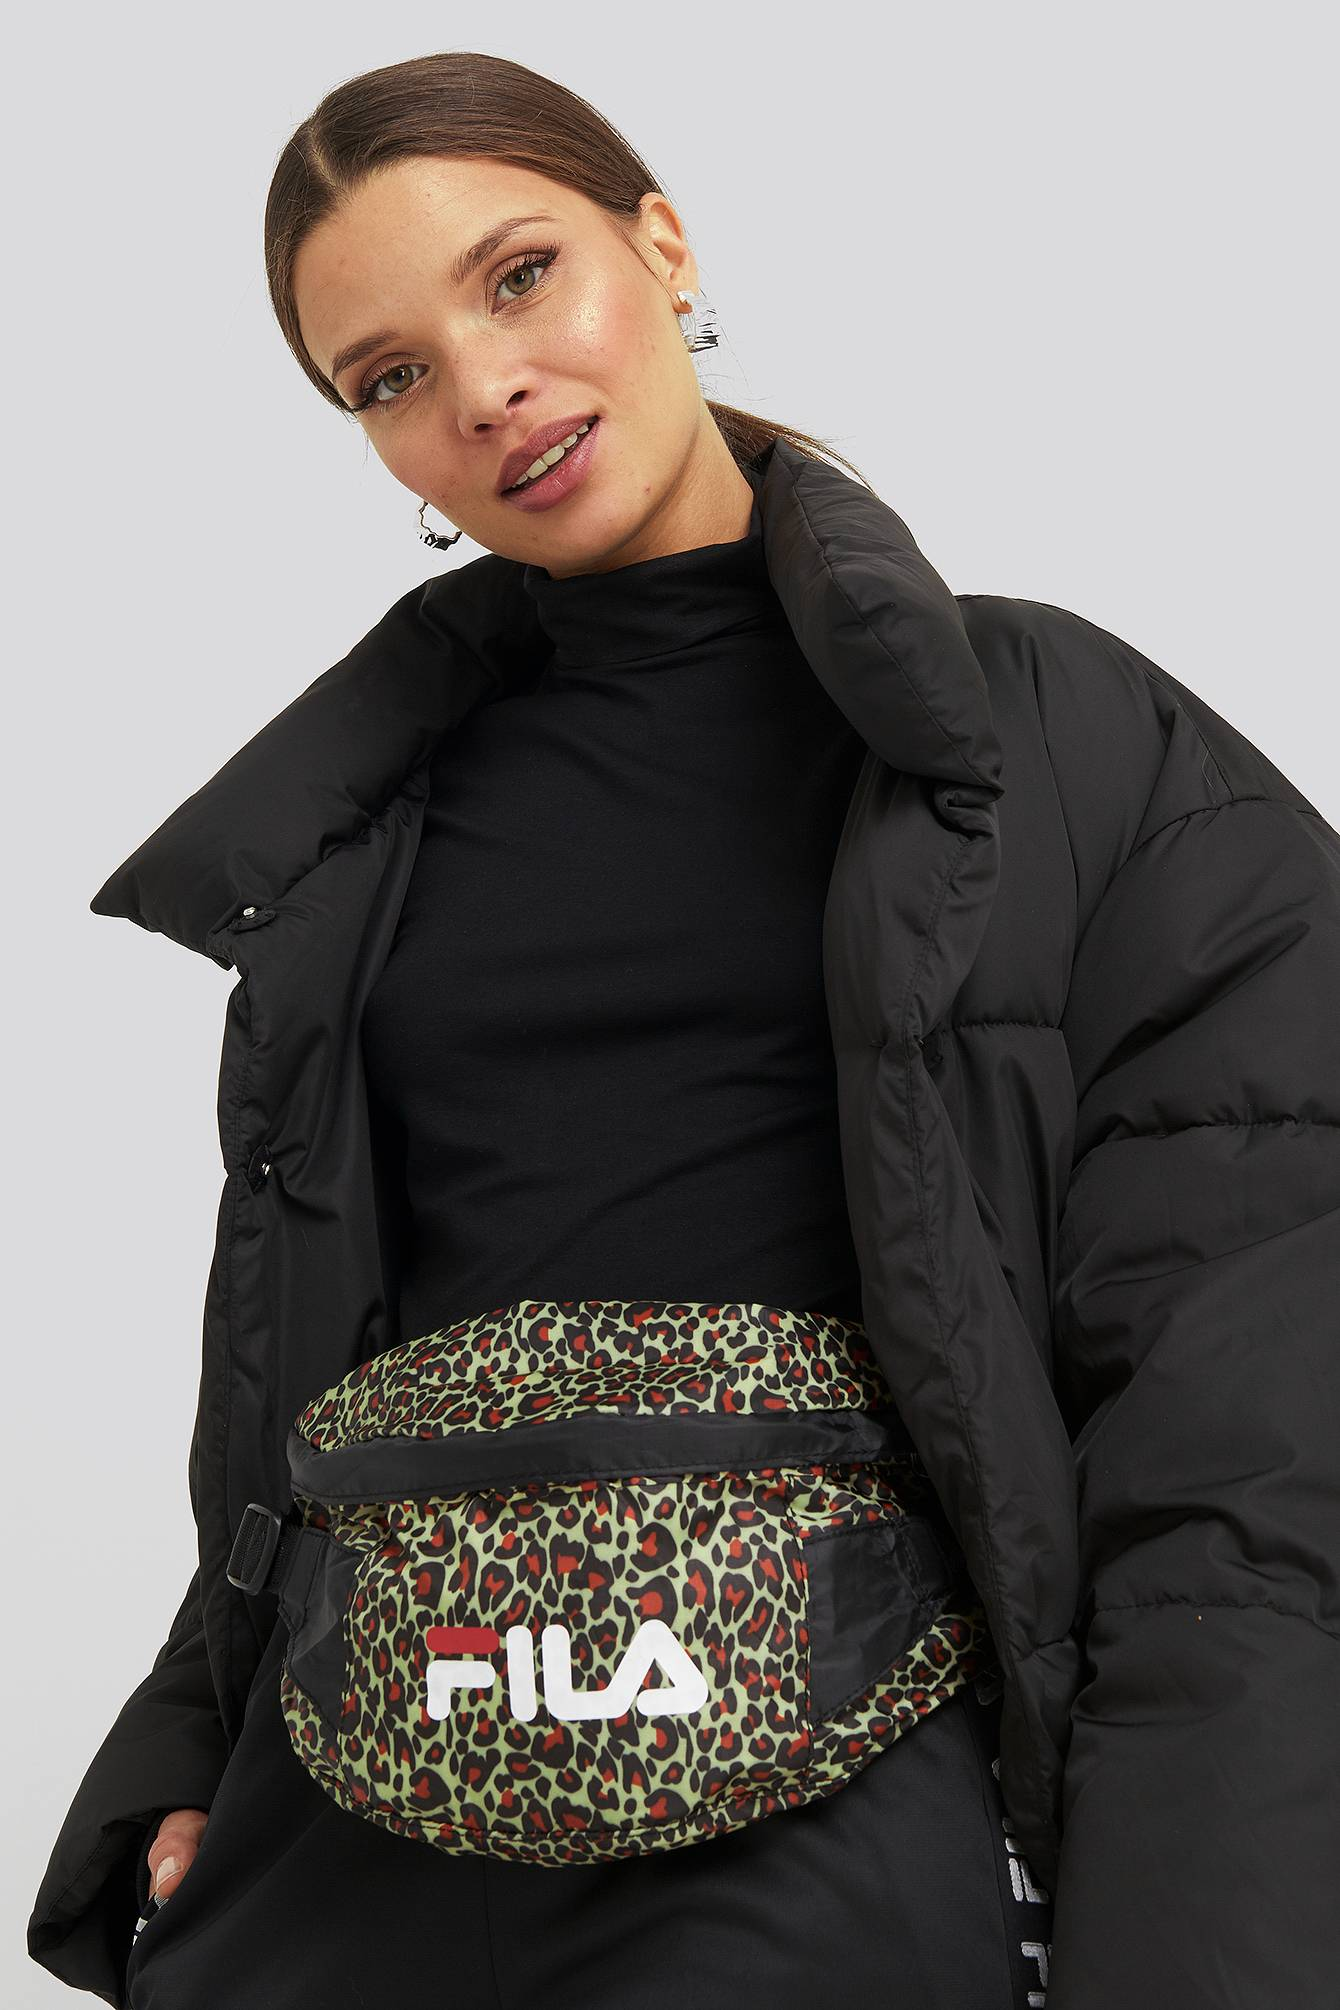 FILA Light Weight Waist Bag Göteborg - Multicolor  - Size: One Size